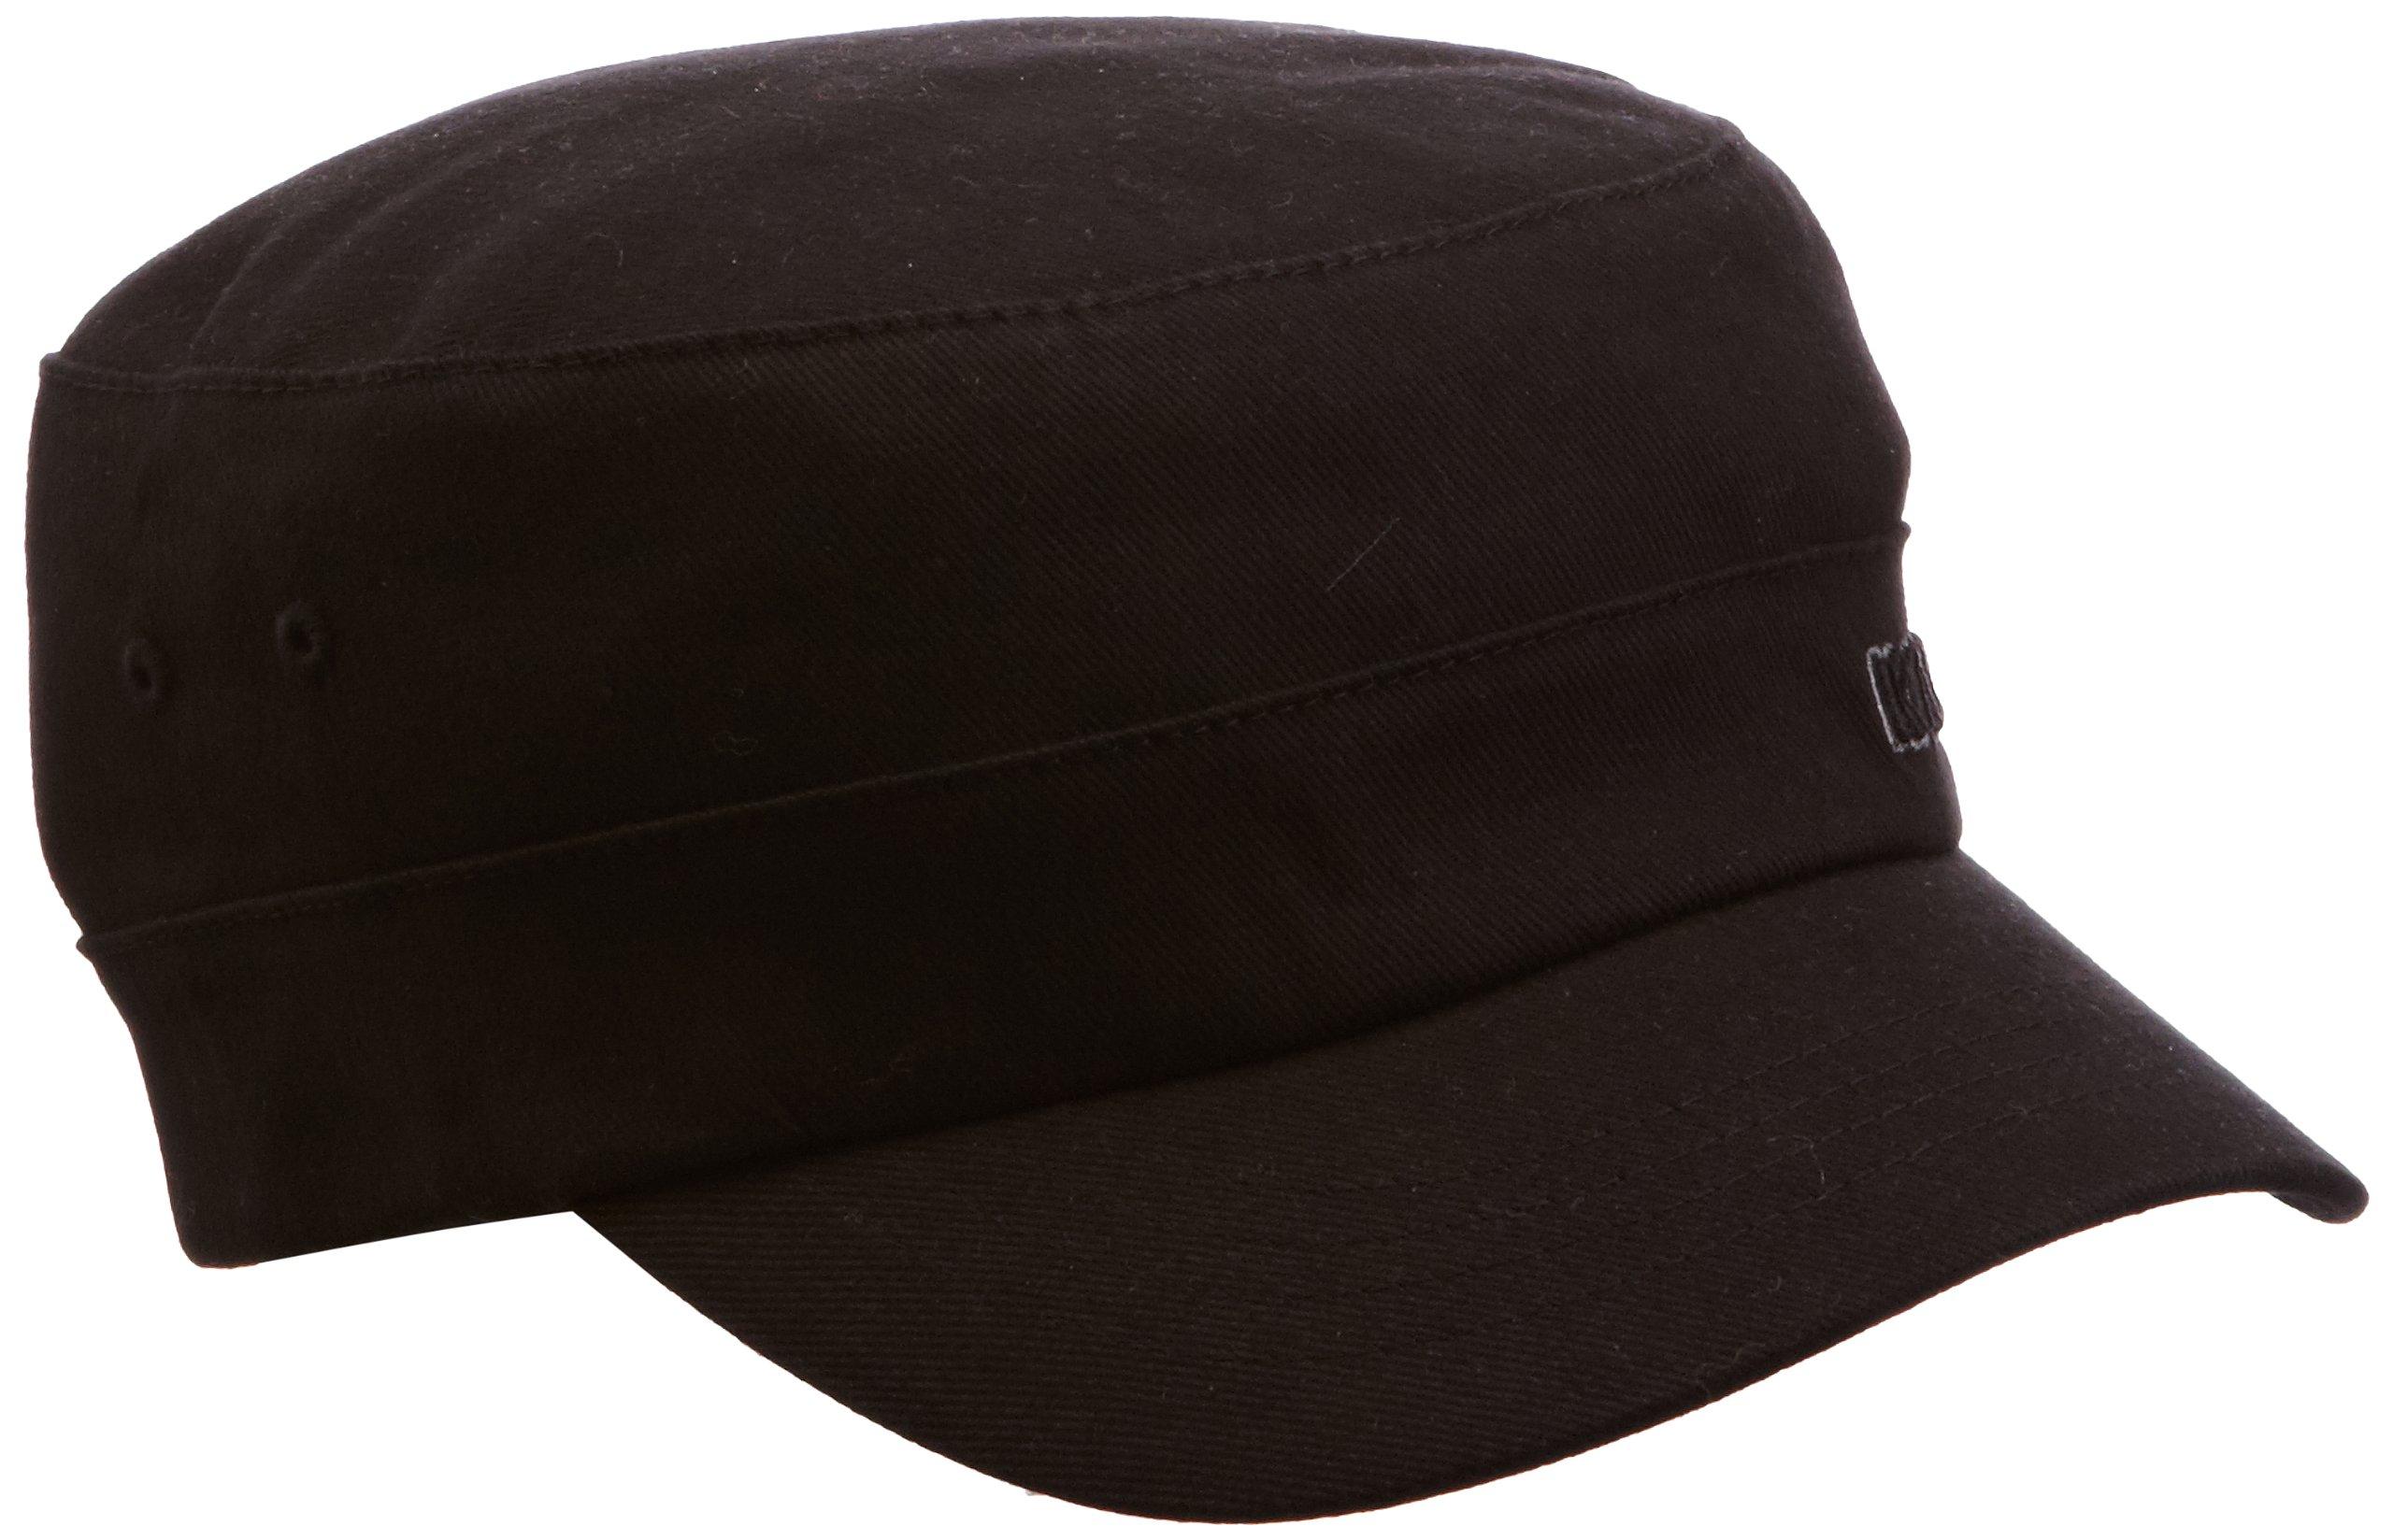 Kangol Men's Flexfit Army Cap, Black Small/Medium